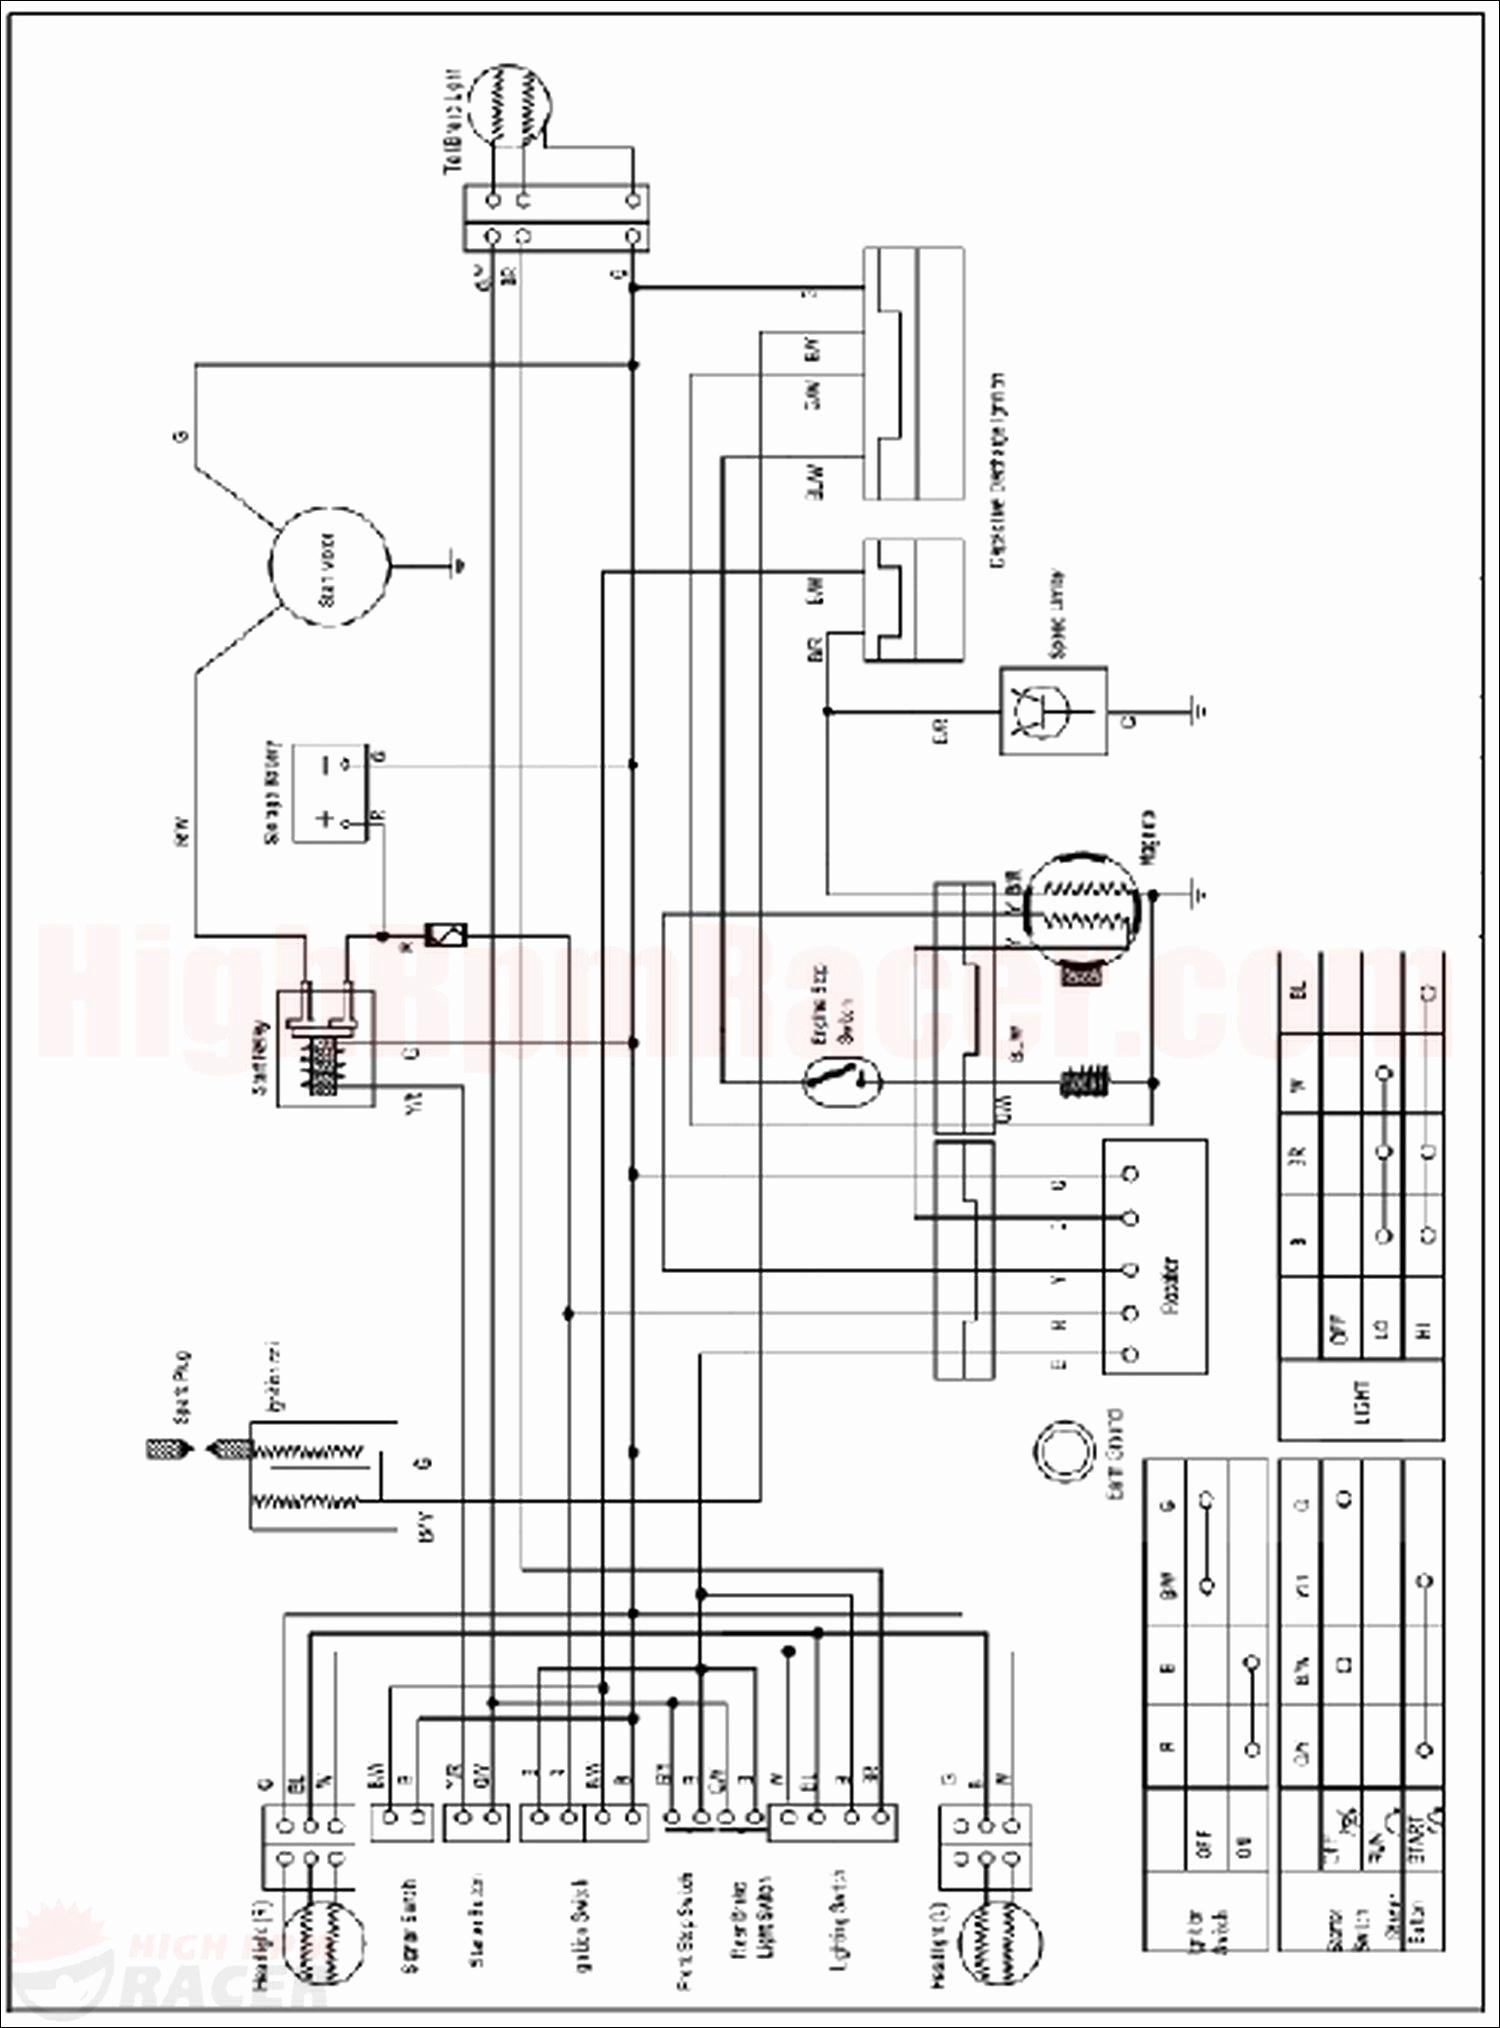 Honda 110 Atv Wiring Harness For